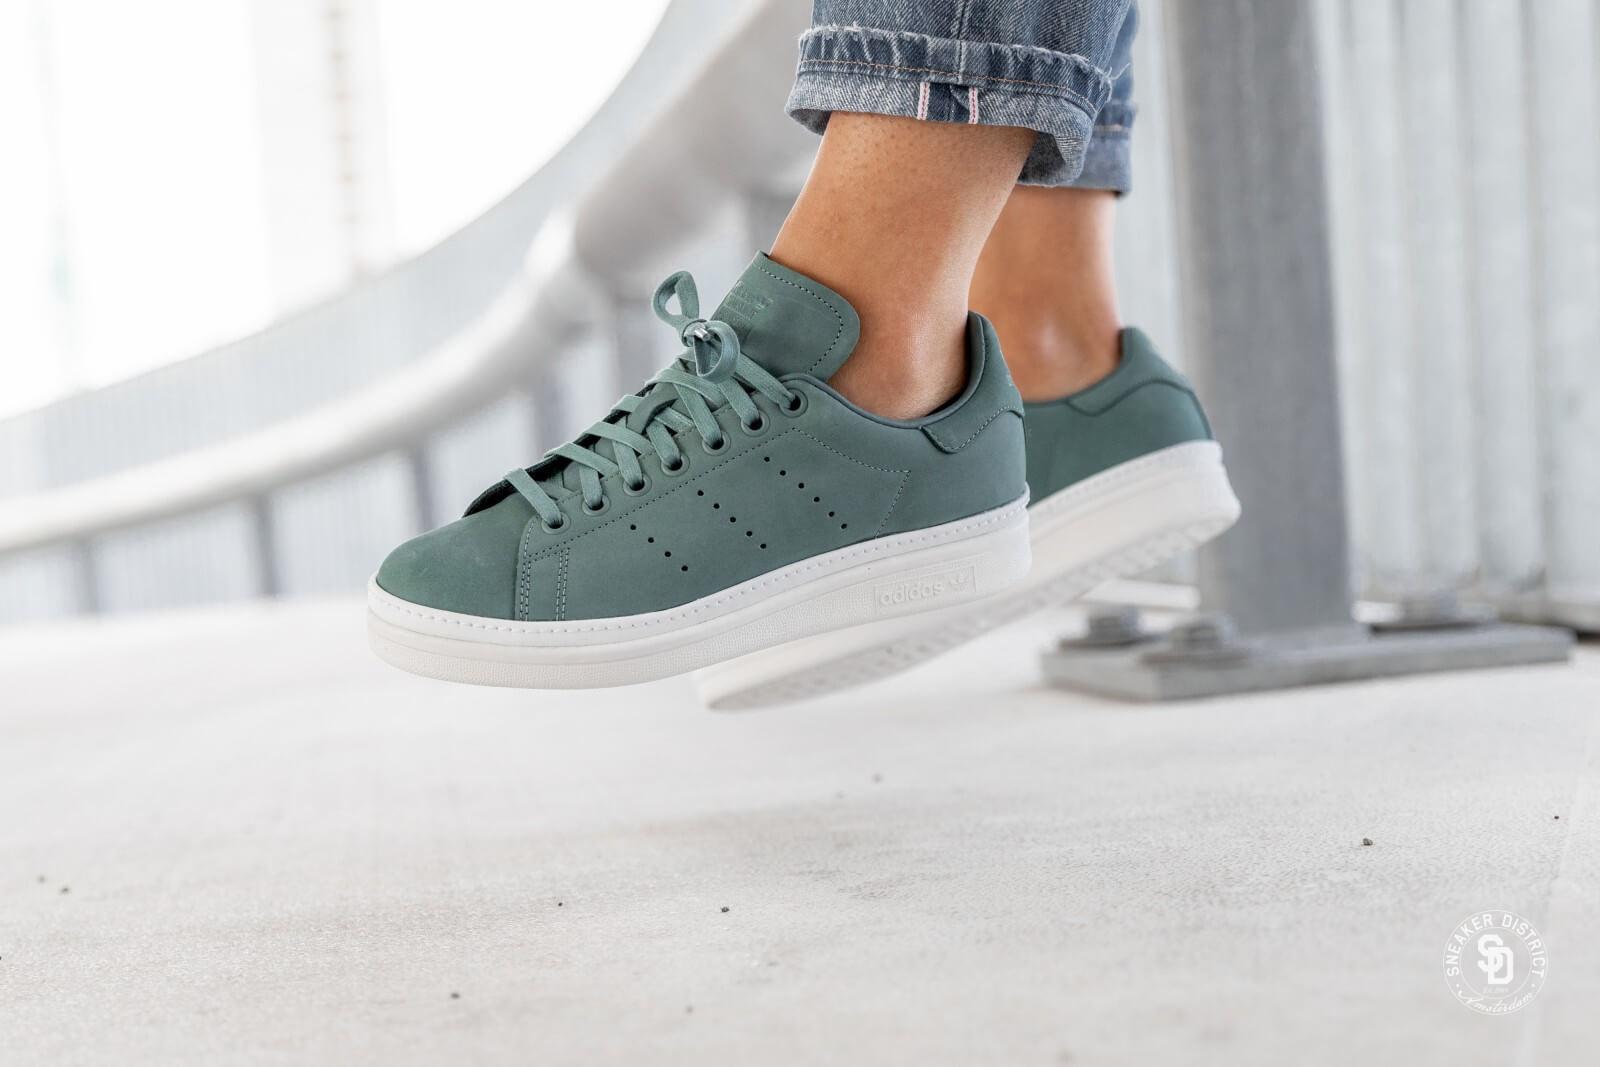 Adidas Women's Stan Smith New Bold Raw Green/Cloud White